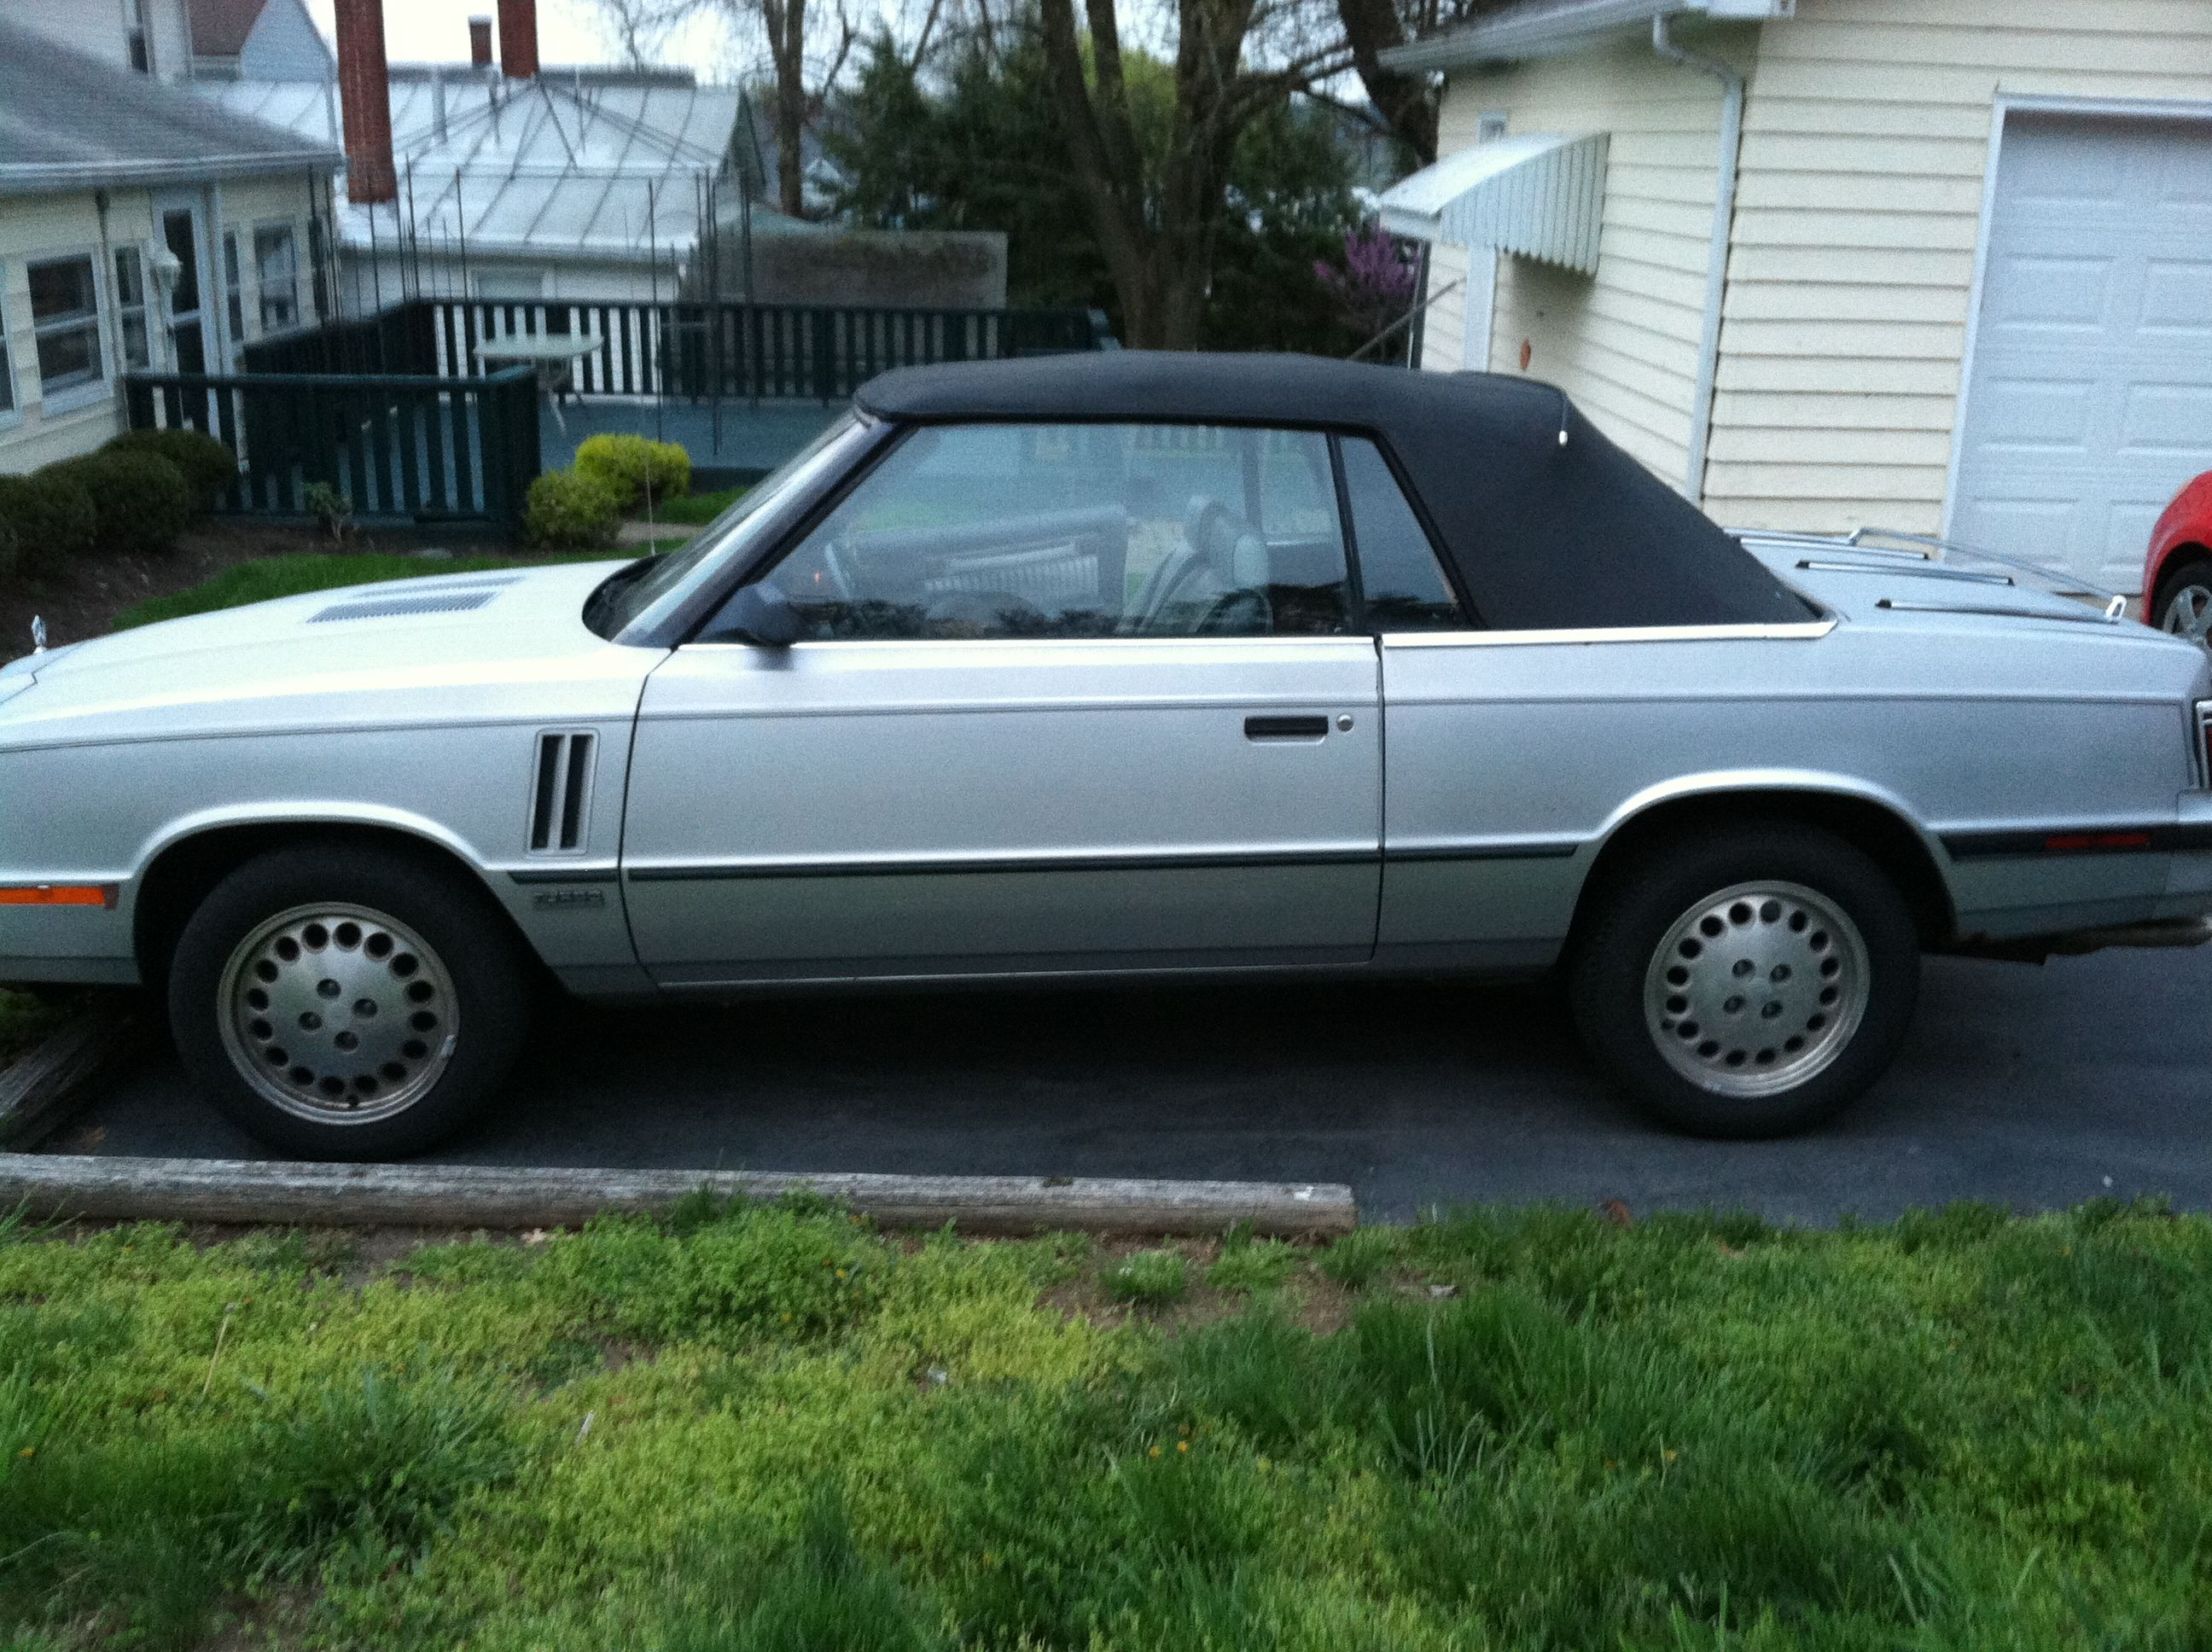 1984 Dodge 600 for Sale in Waynesville, Ohio. Email Daniellecoots@yahoo.com. $700 OBO.